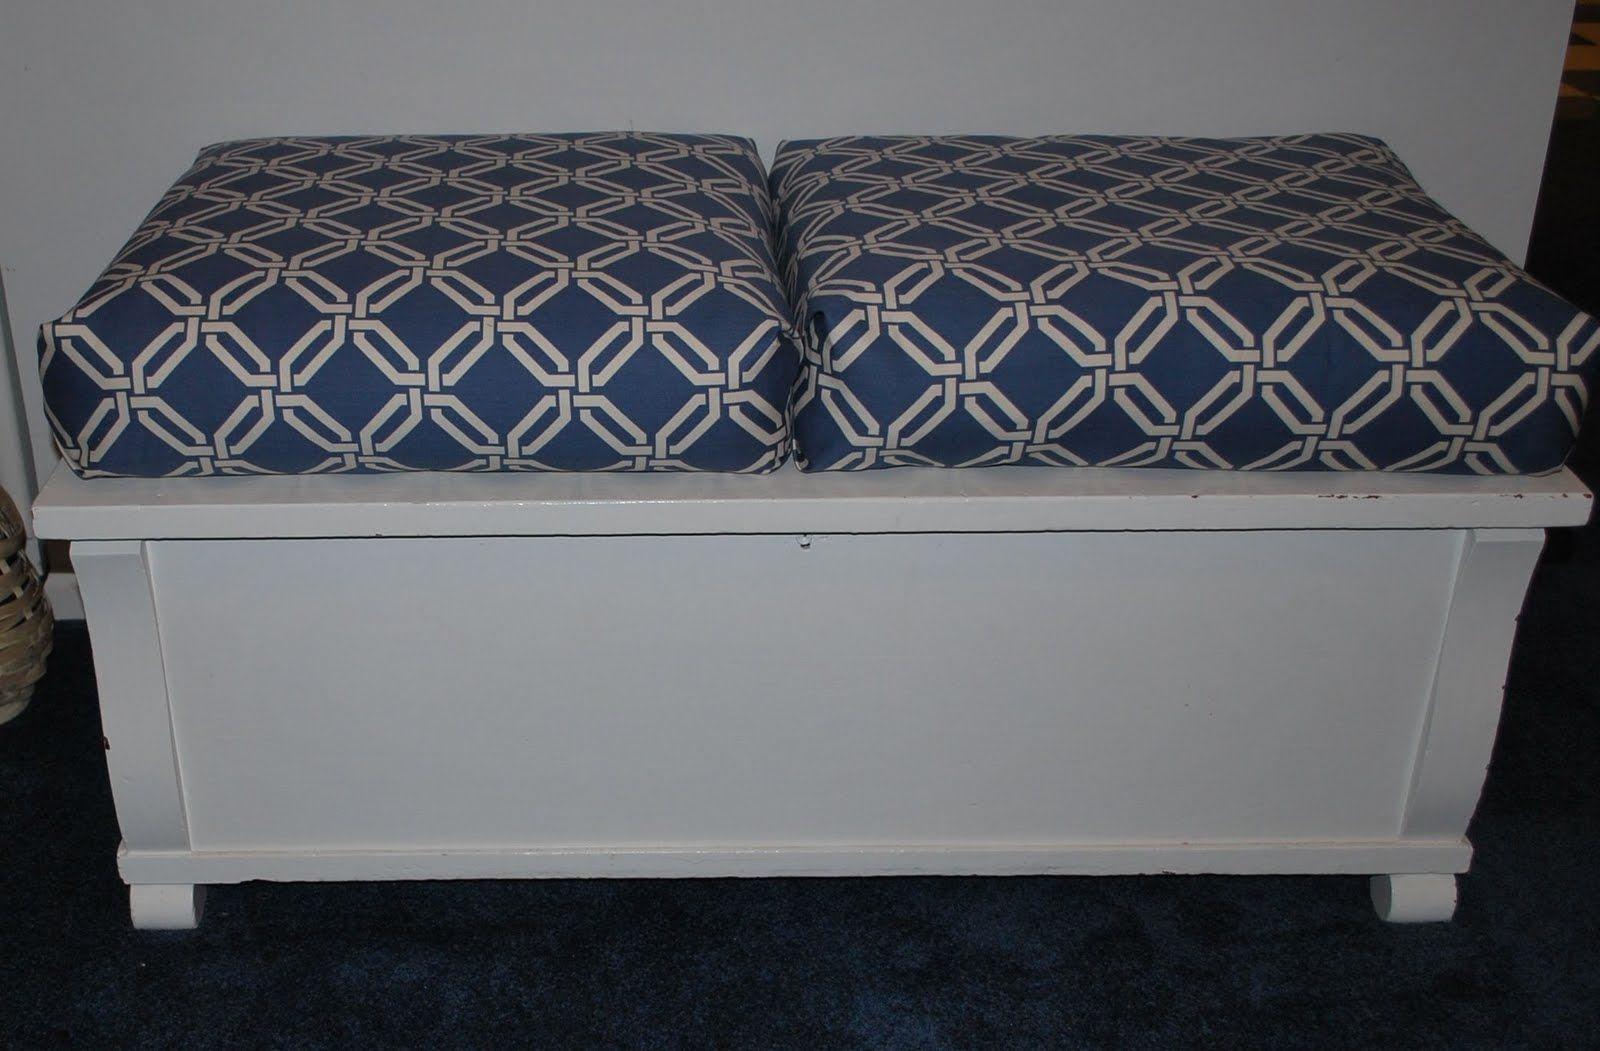 Almost No Sew Box Cushions Sewing Cushions Box Cushion